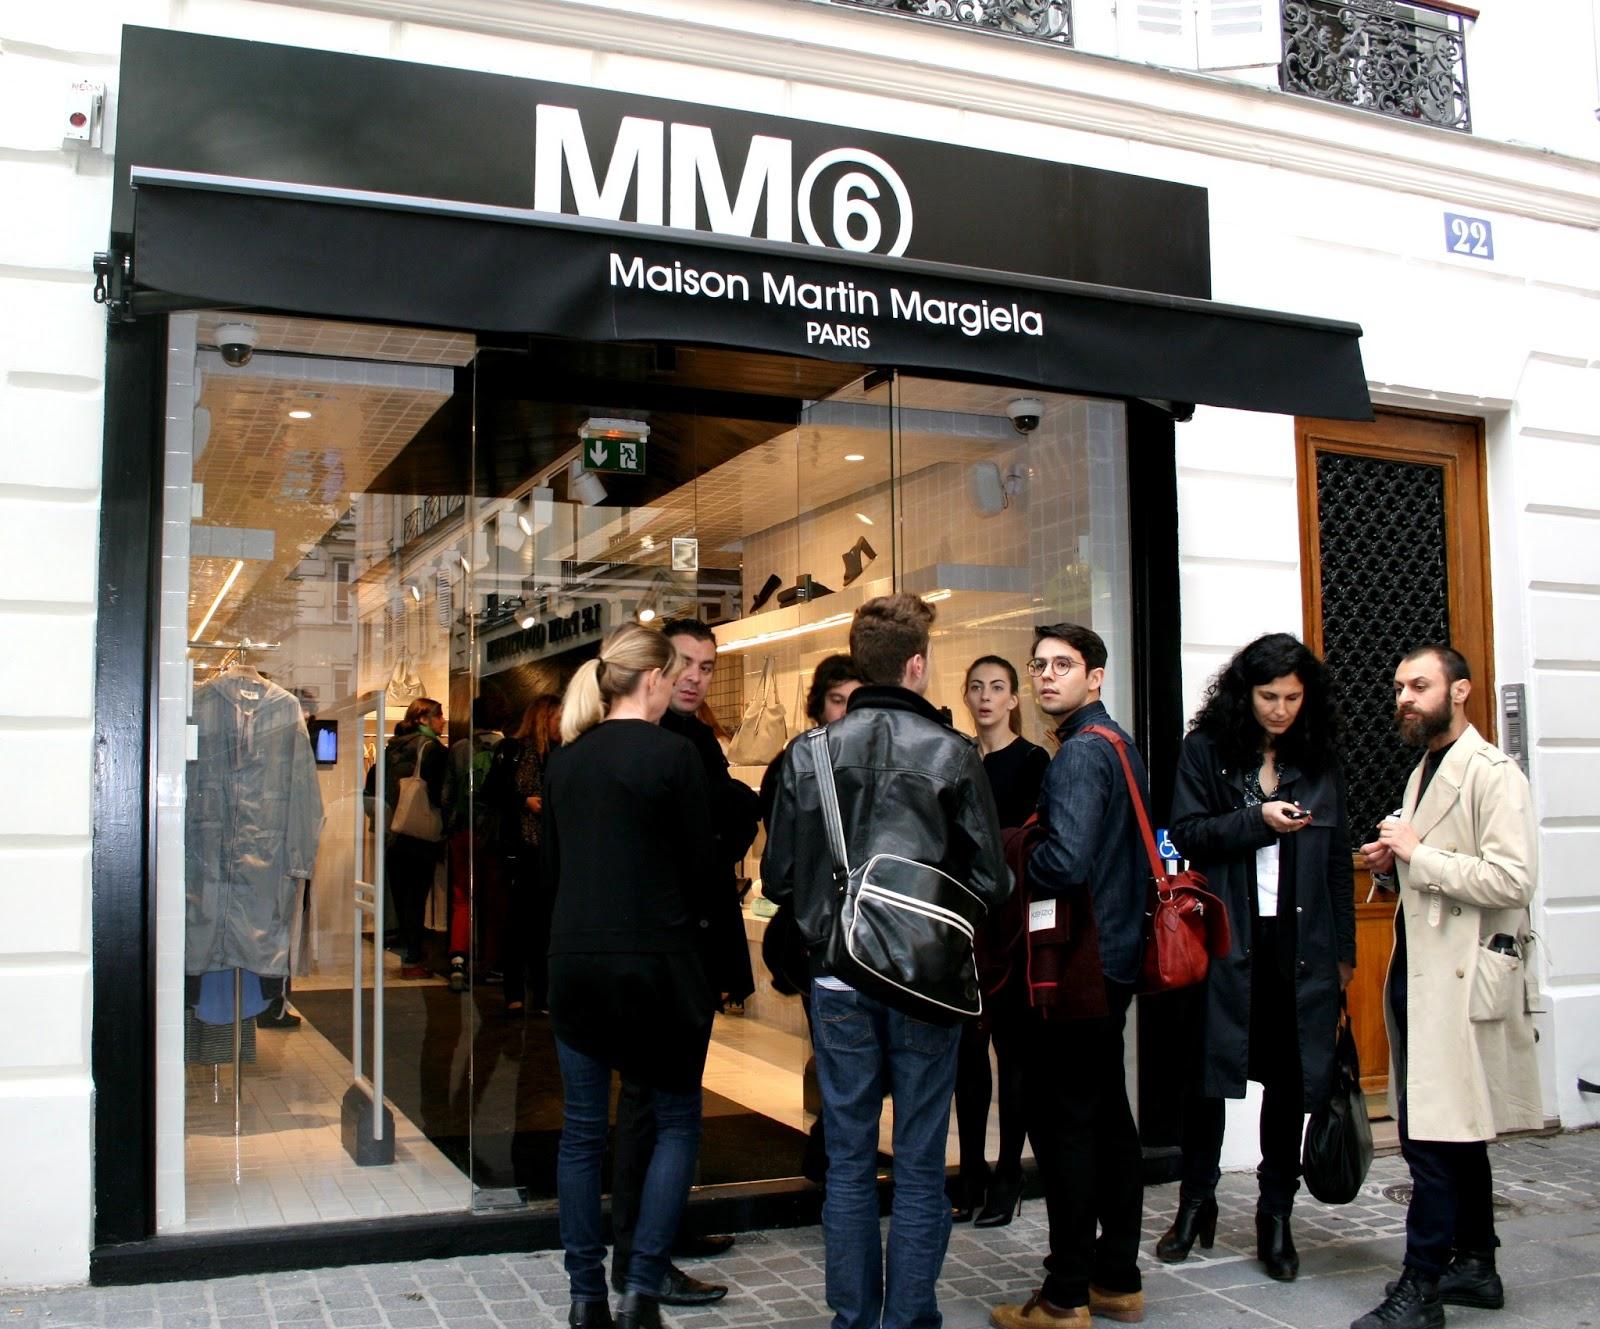 Le blog d'Anastasia: Inauguration de la boutique MM6 : Maison Martin Margiela.